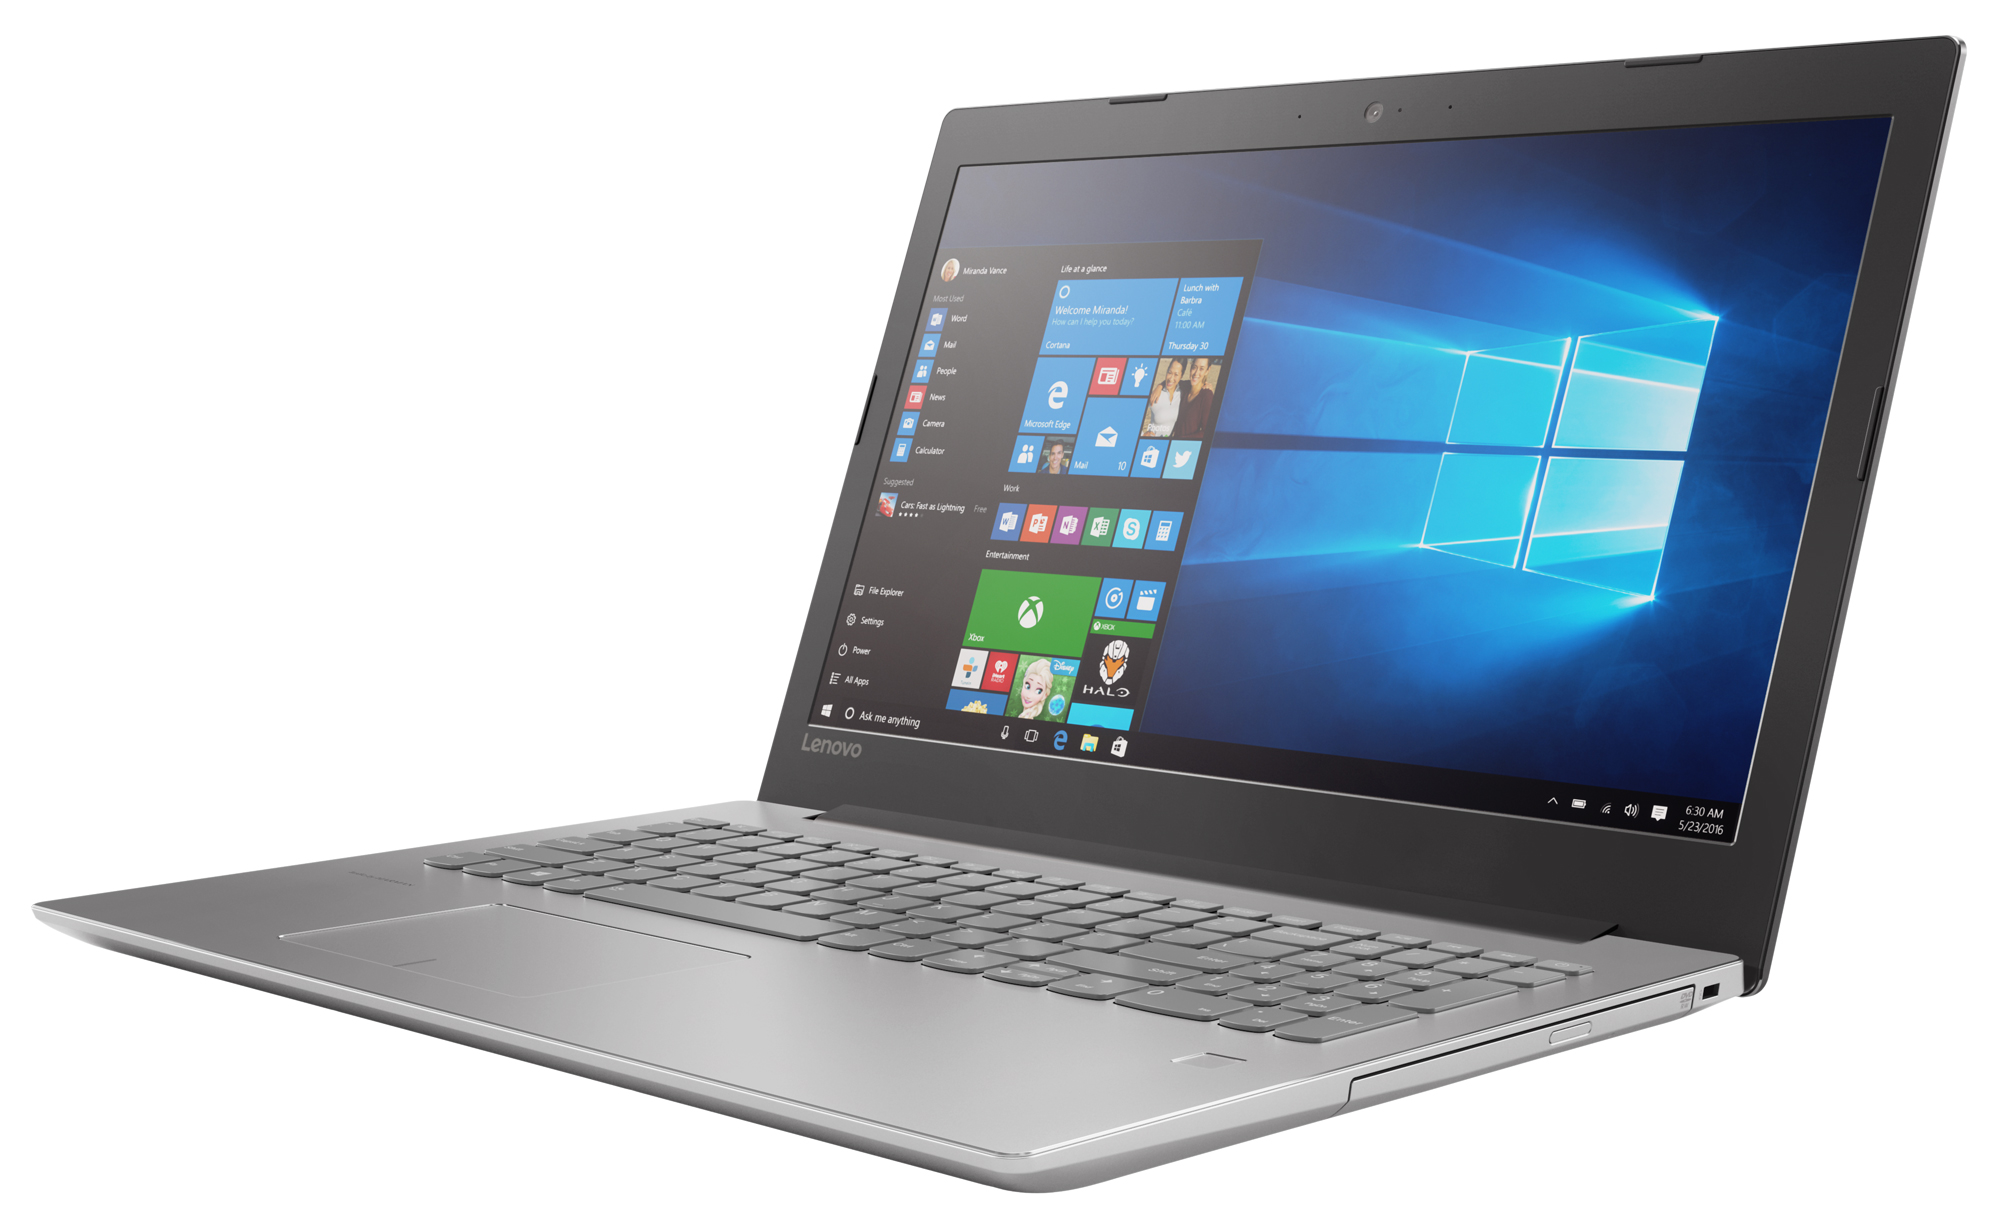 Фото  Ноутбук Lenovo ideapad 520-15IKB Iron Grey (81BF001CRU)